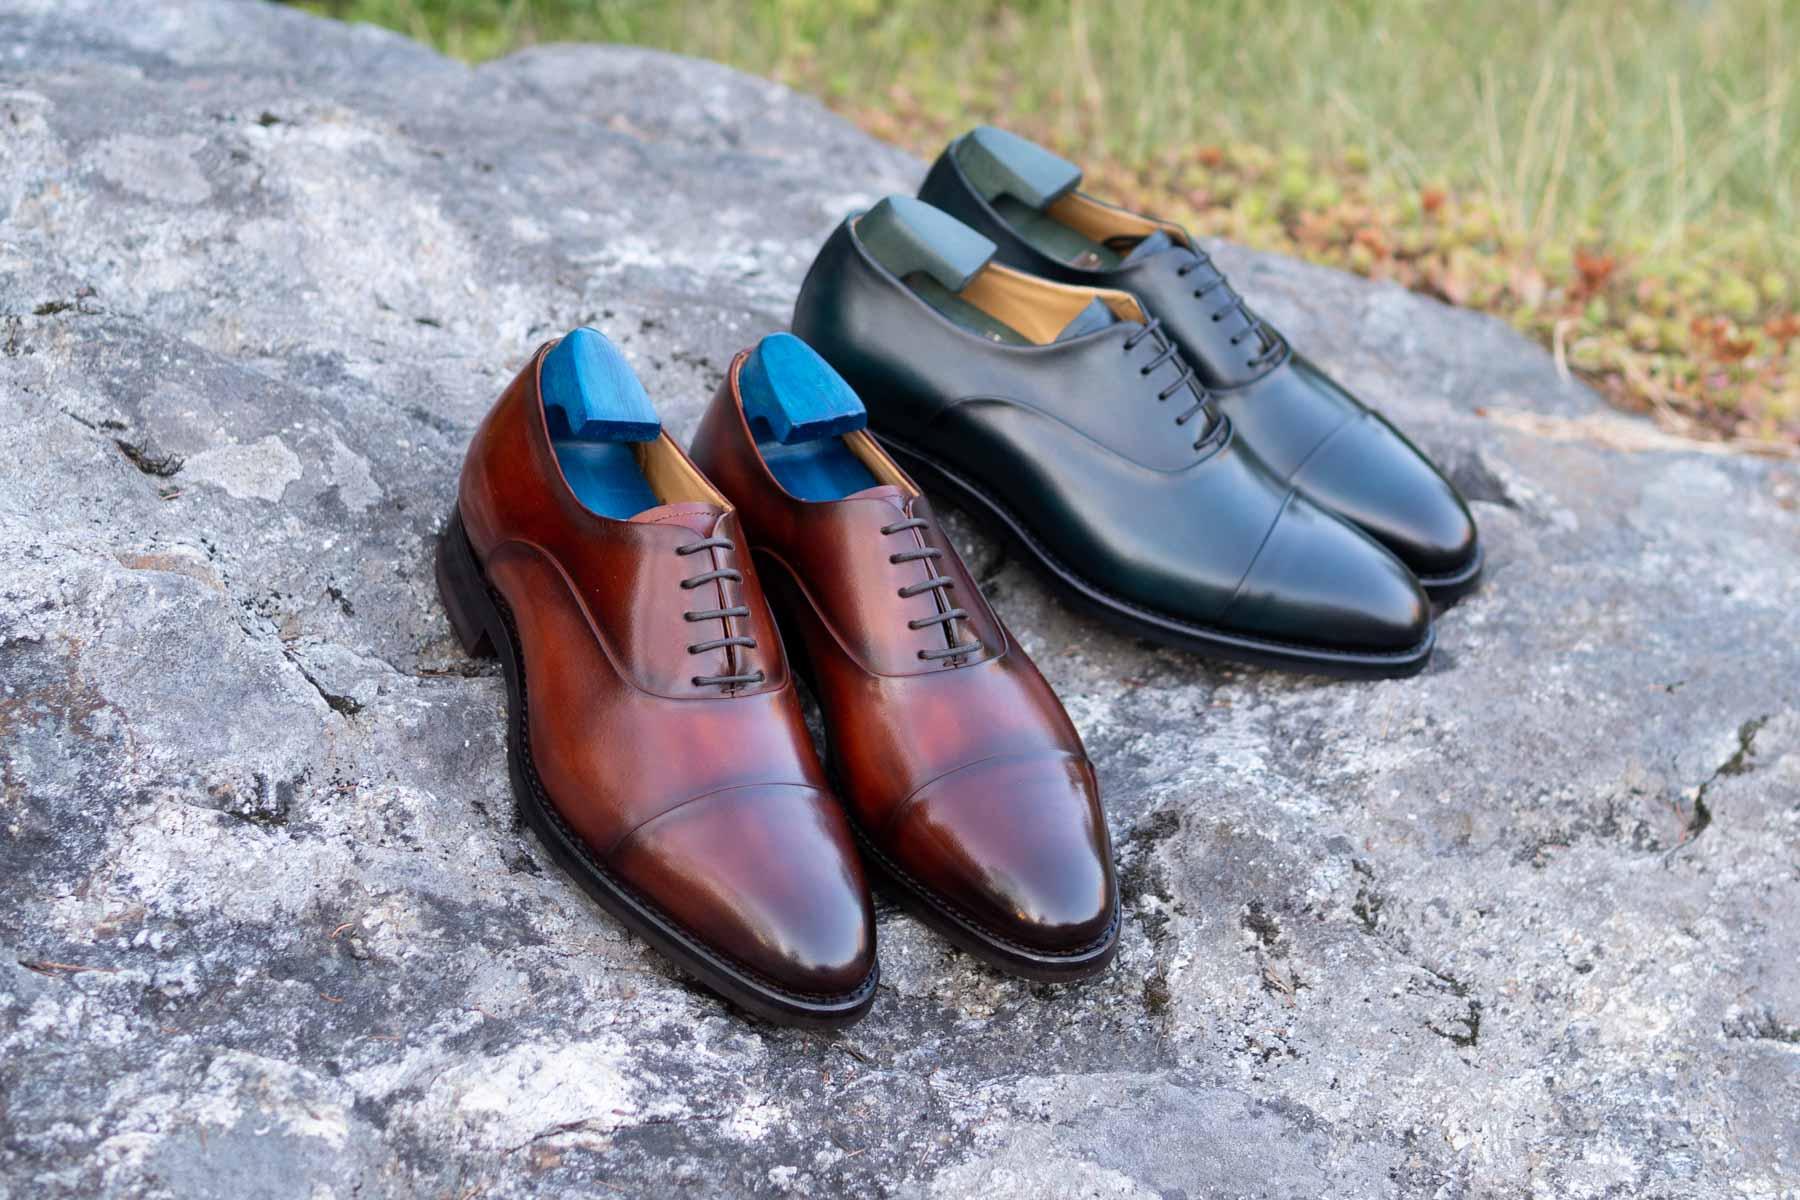 Carlos Santos 9899 Handgrade Oxford in Patina for The Noble Shoe GMTO